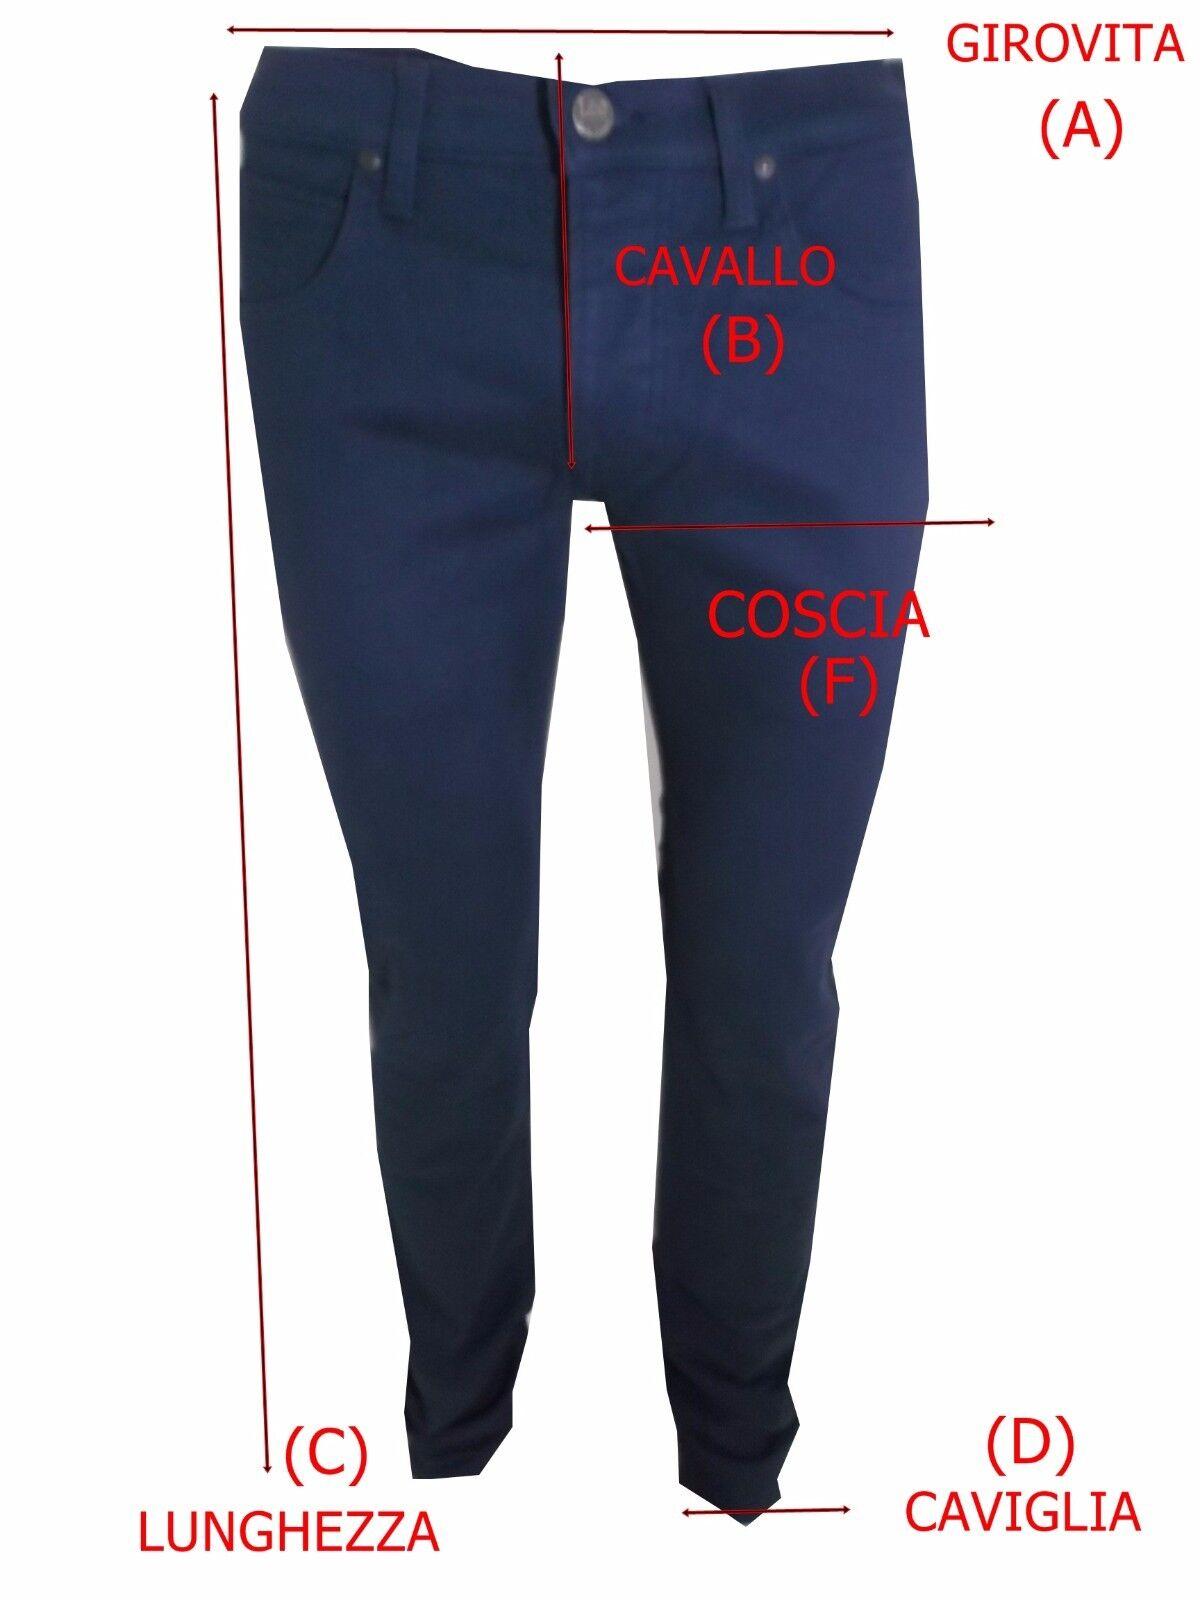 Jeans Jeans Jeans gas da donna con strass elasticizzati a gamba dritta vita bassa W28 42 blu 20da5b